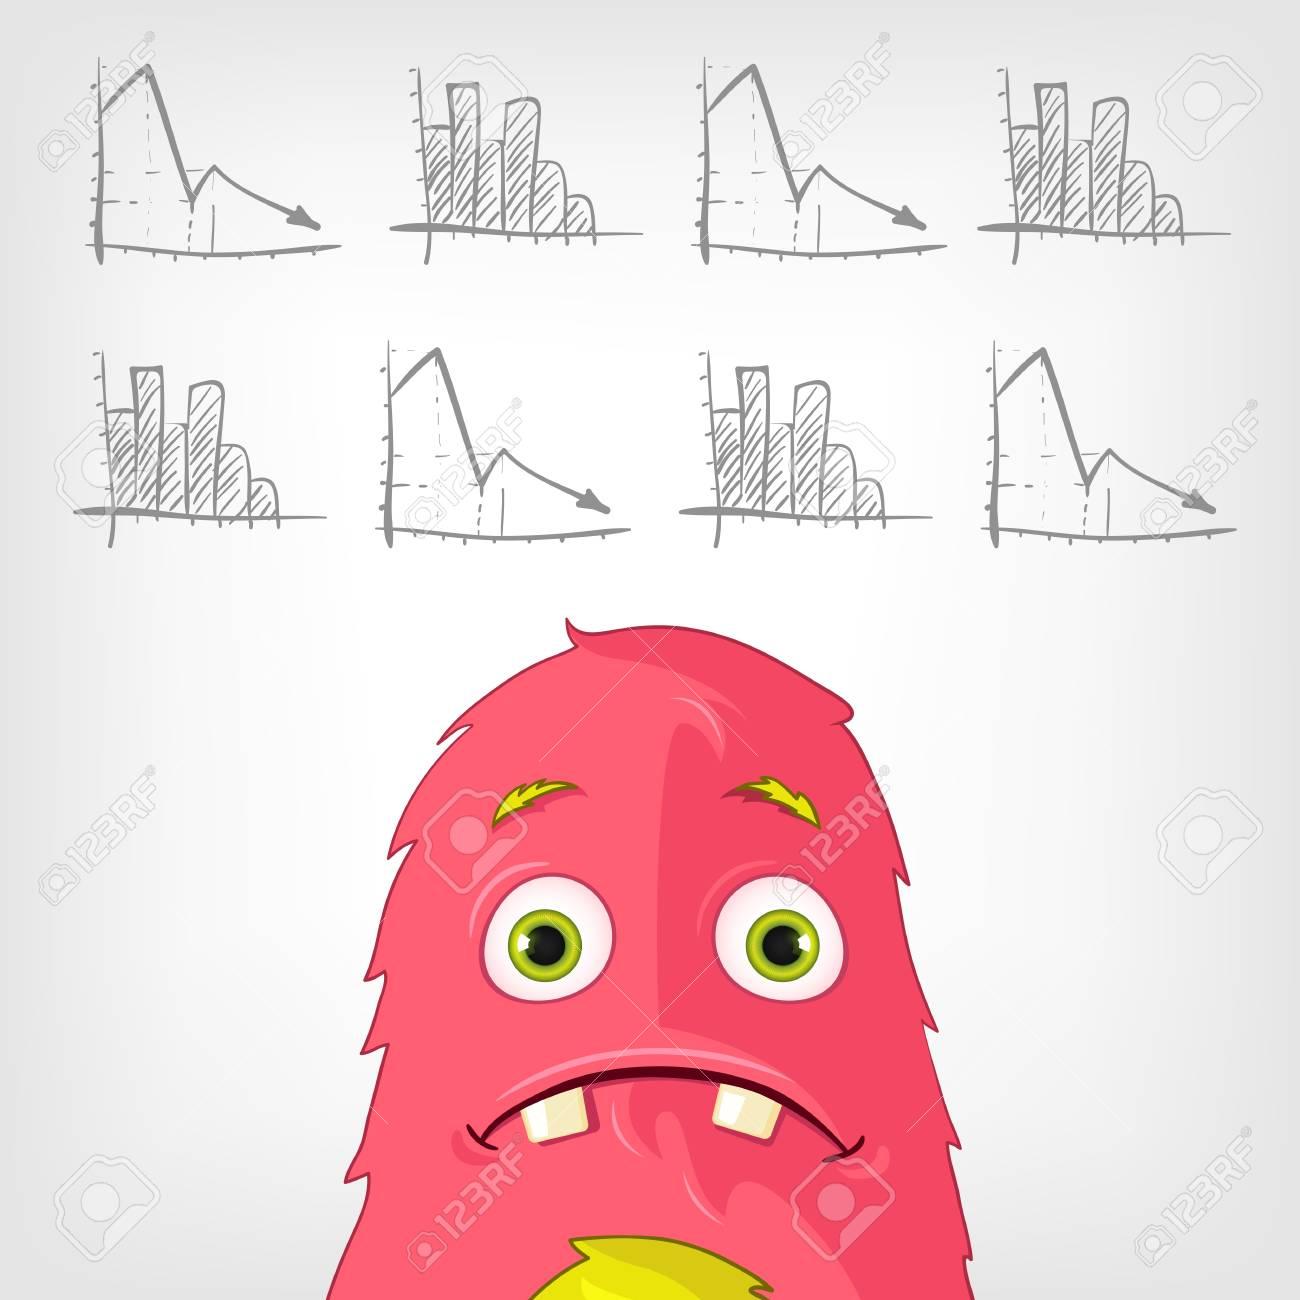 Funny Monster Stock Vector - 17677809